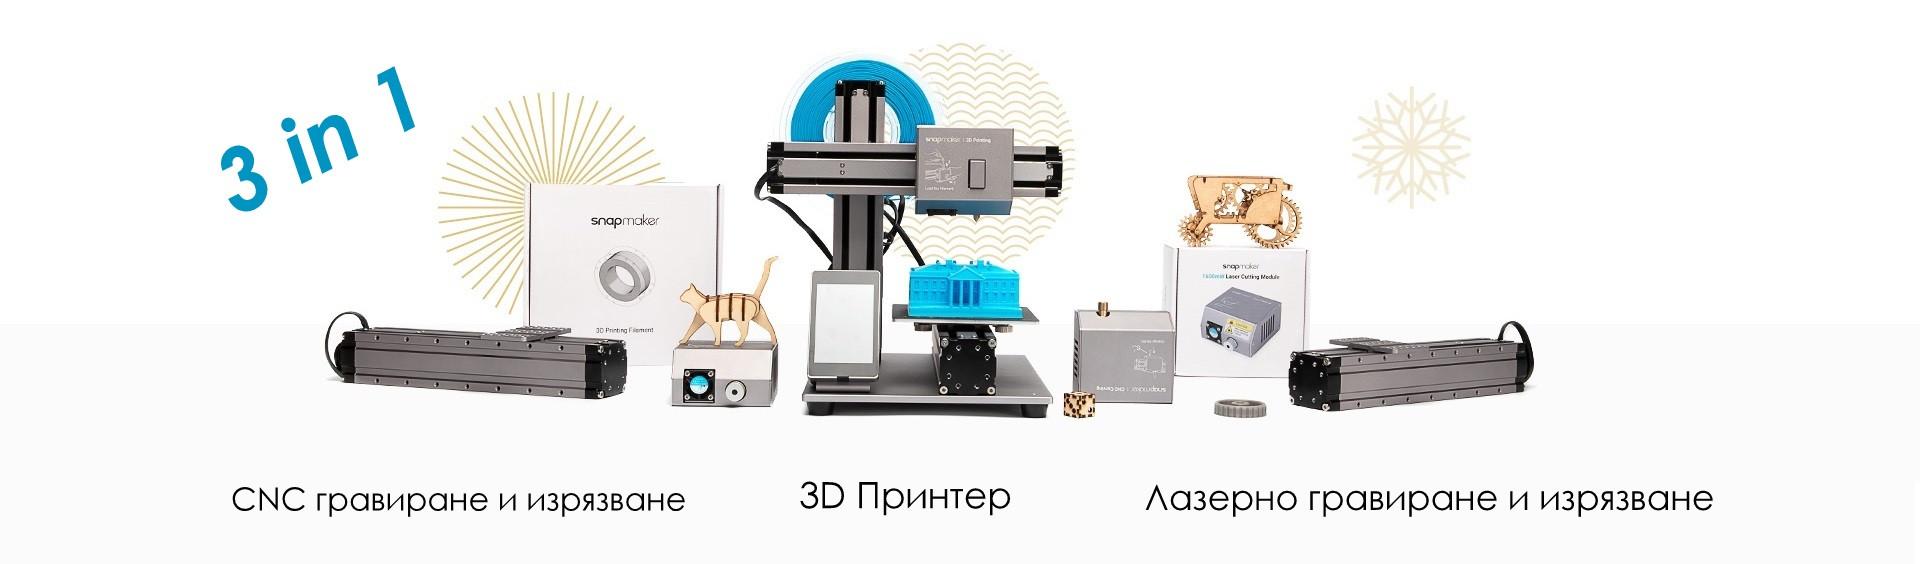 snapmaker 3 in 1 принтер / CNC / лазер